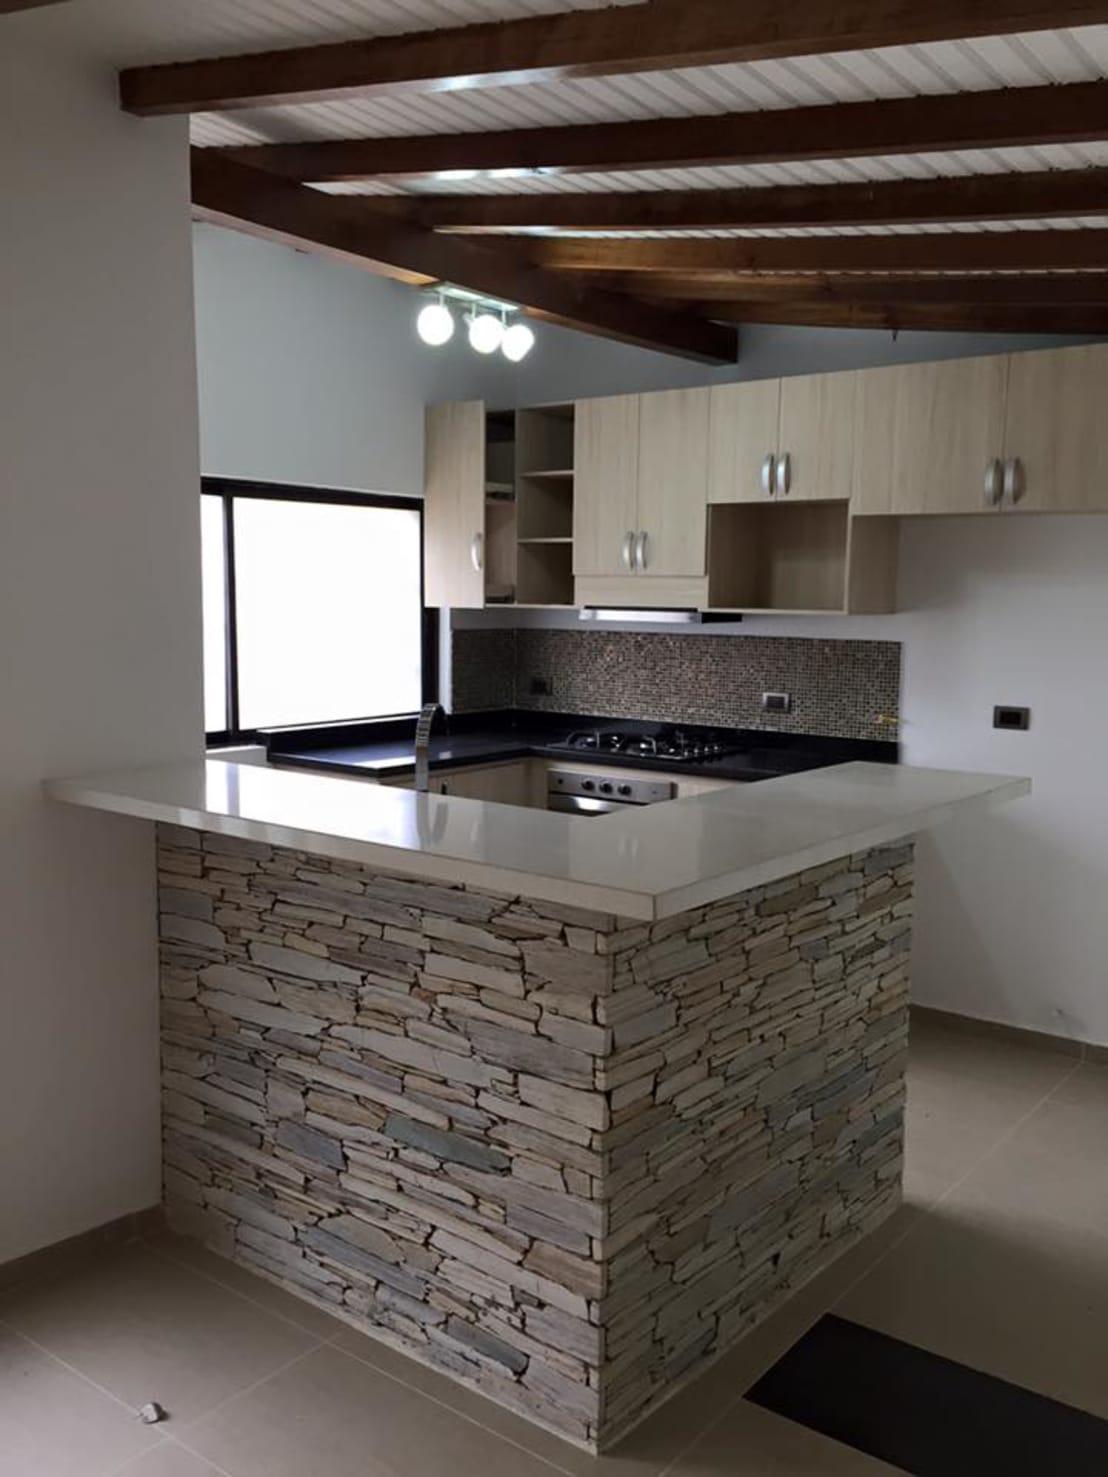 Disenos de barras de cocinas modernas 6 curso de for Diseno y decoracion de cocinas